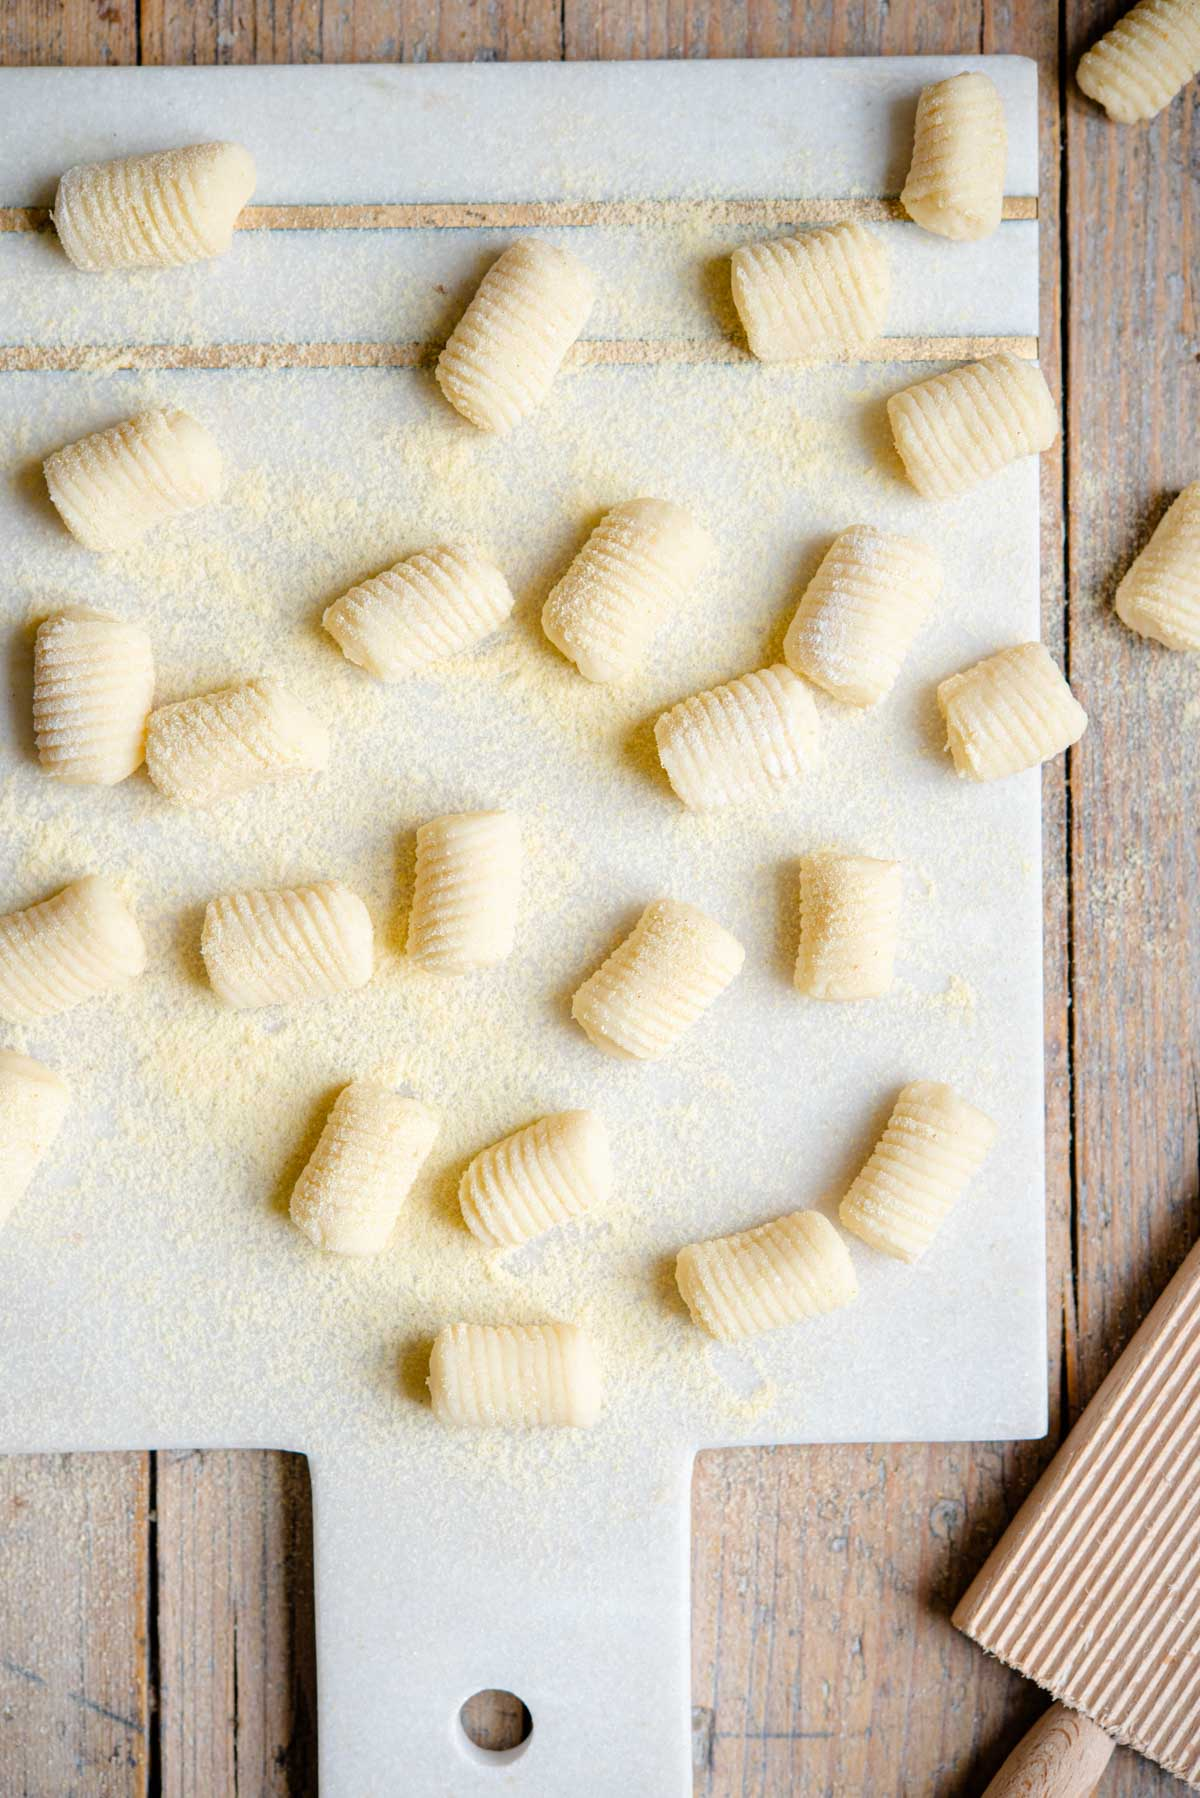 An overhead shot of gnocchi on a cutting board